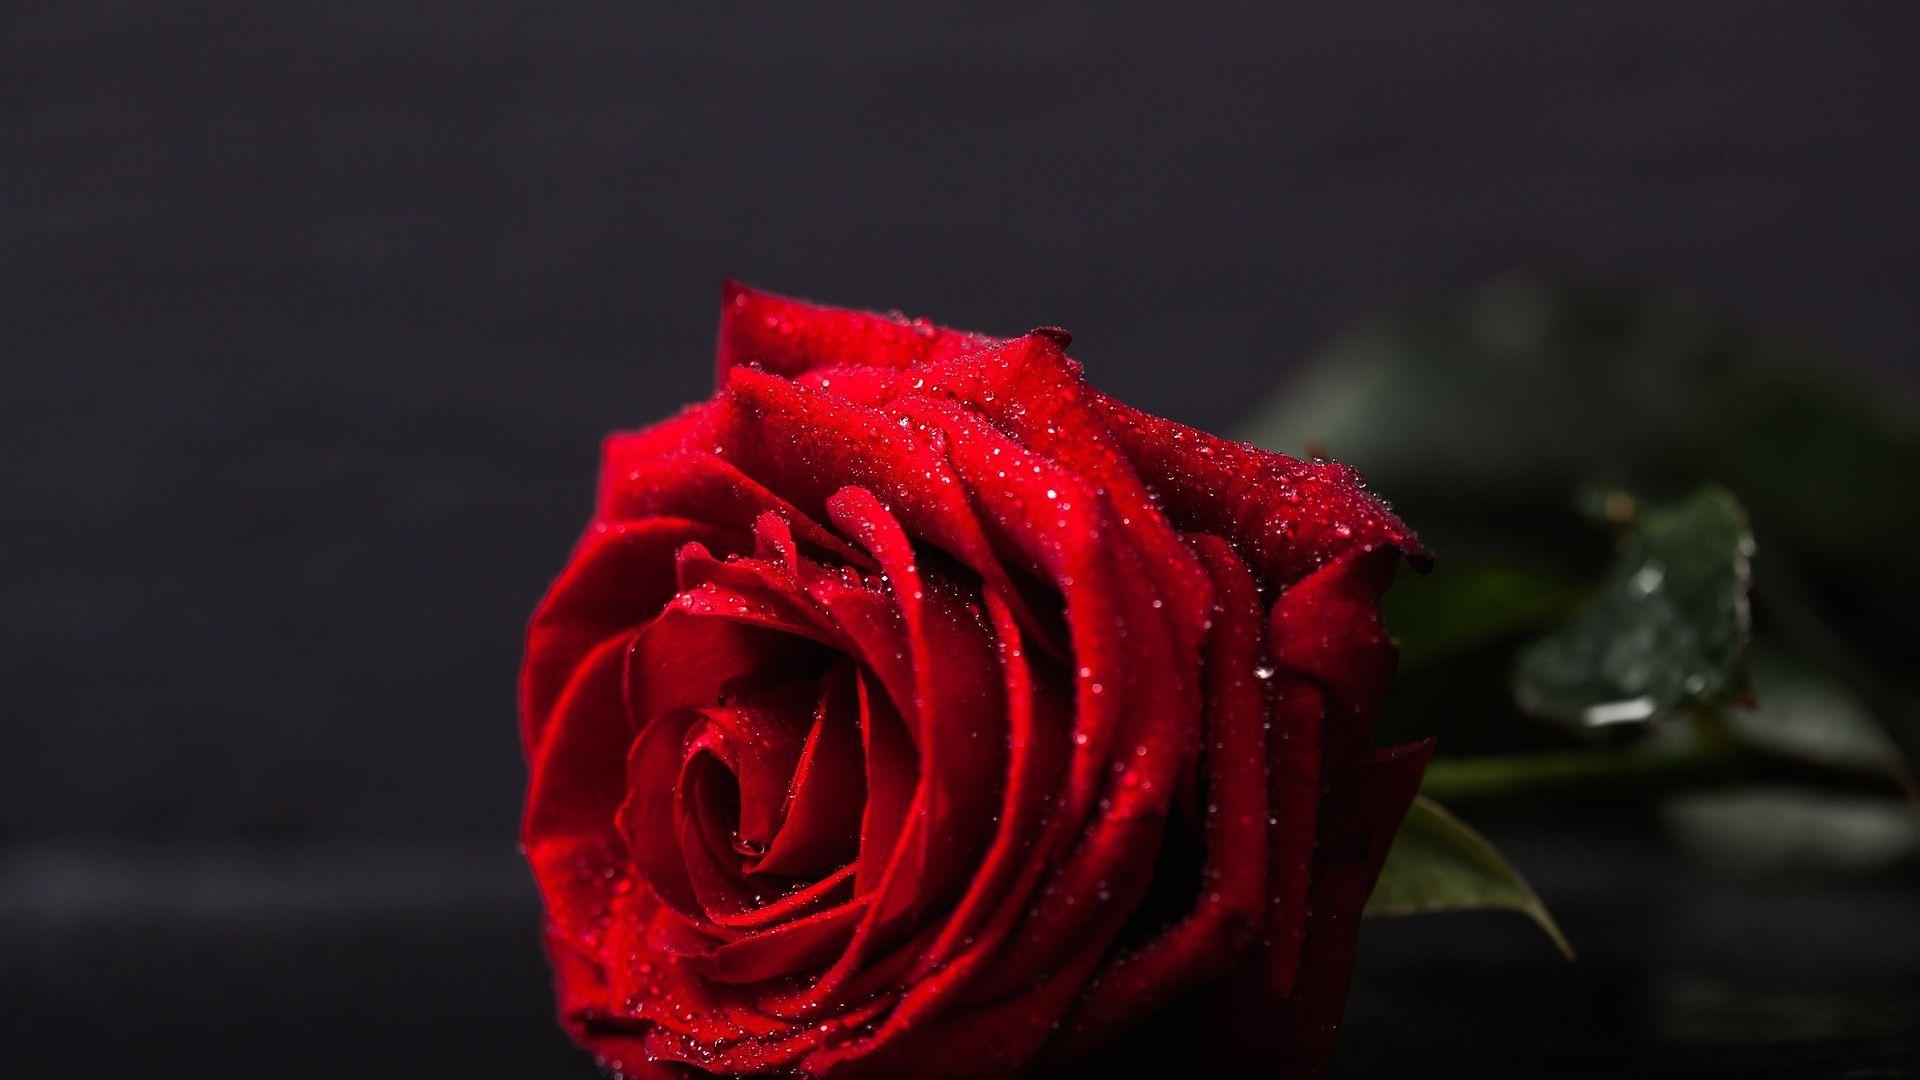 Hình hoa hồng